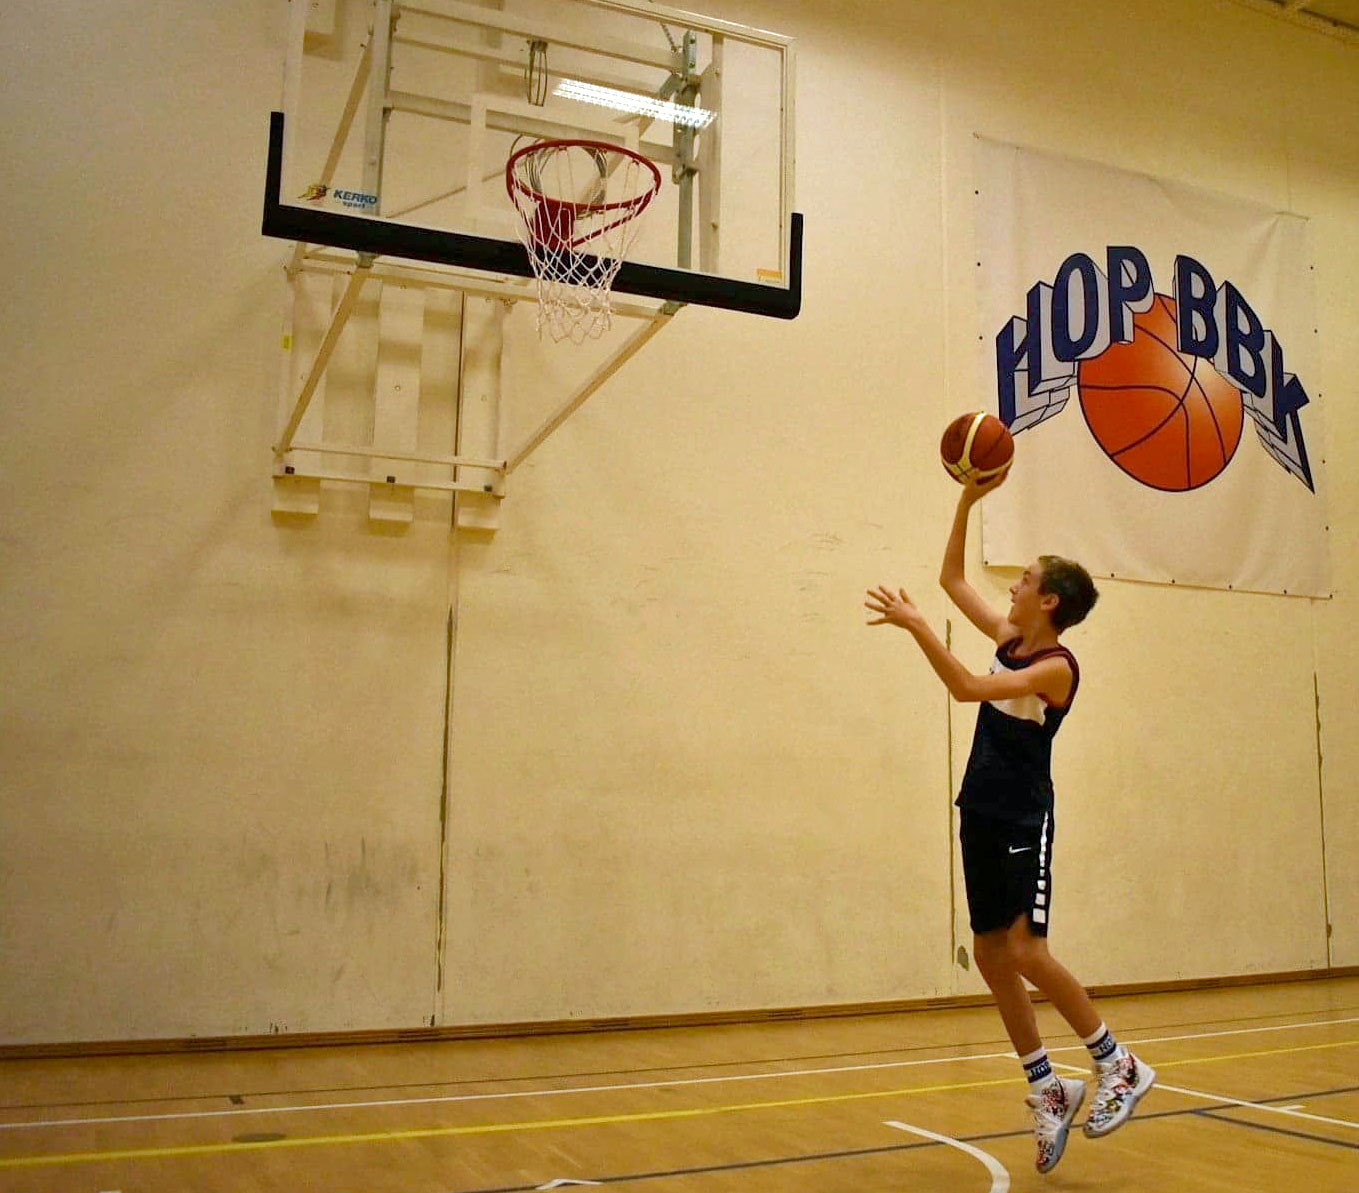 http://hopbasket.no/wp-content/uploads/2020/07/skills-camp.jpg